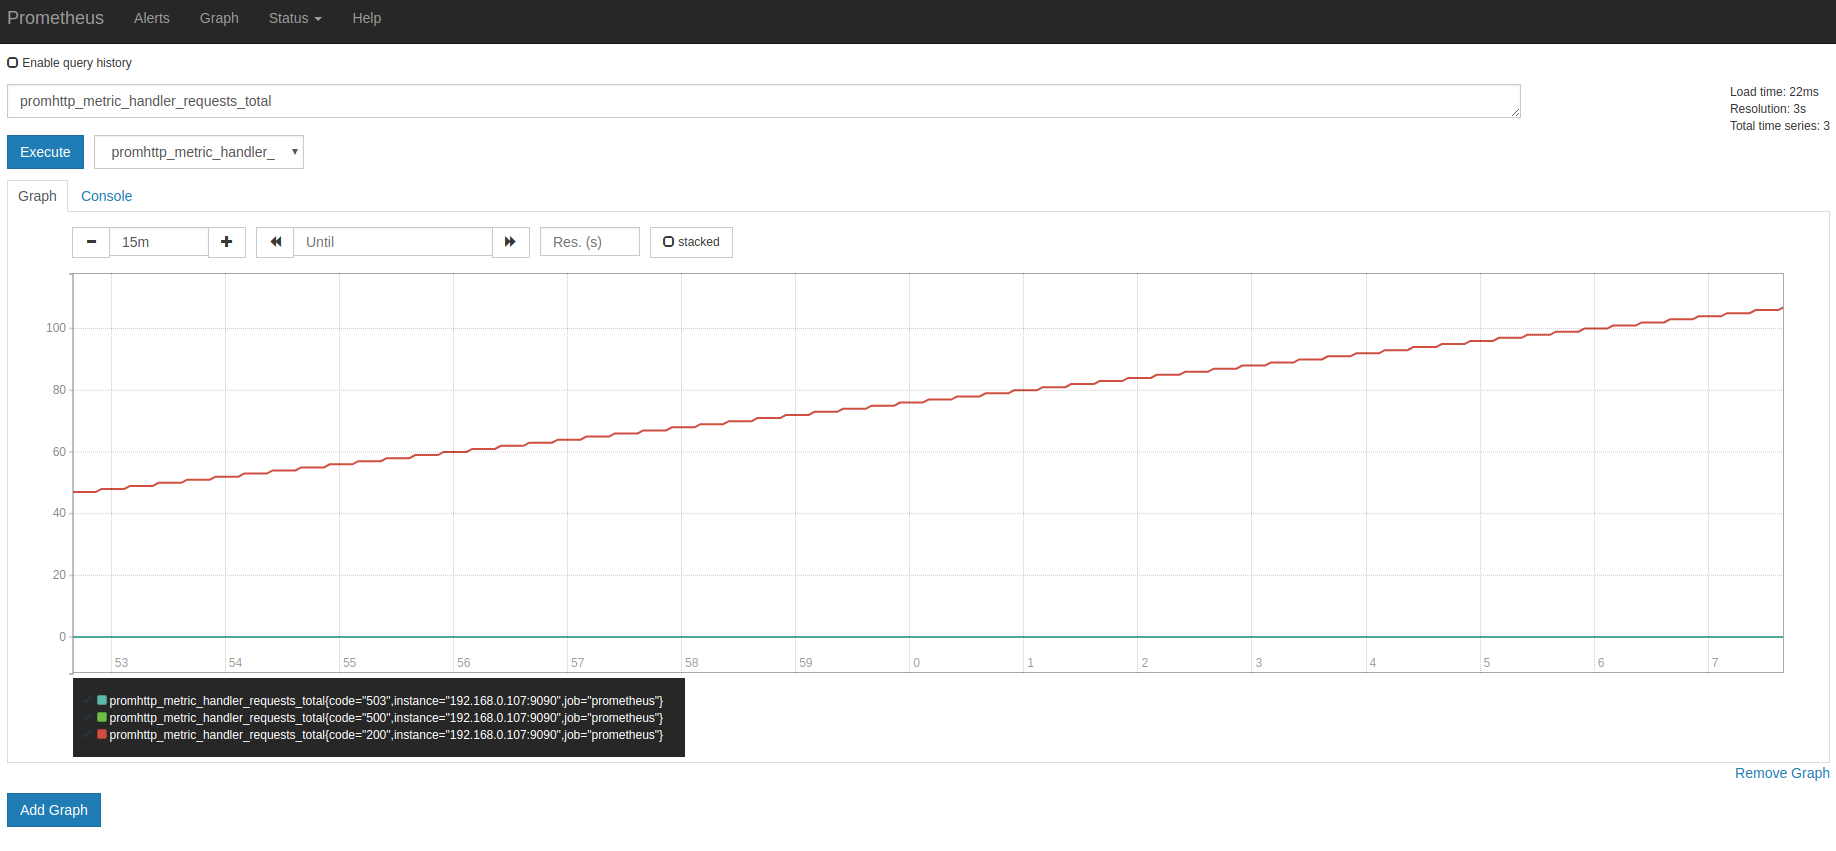 prometheus-graph.jpg